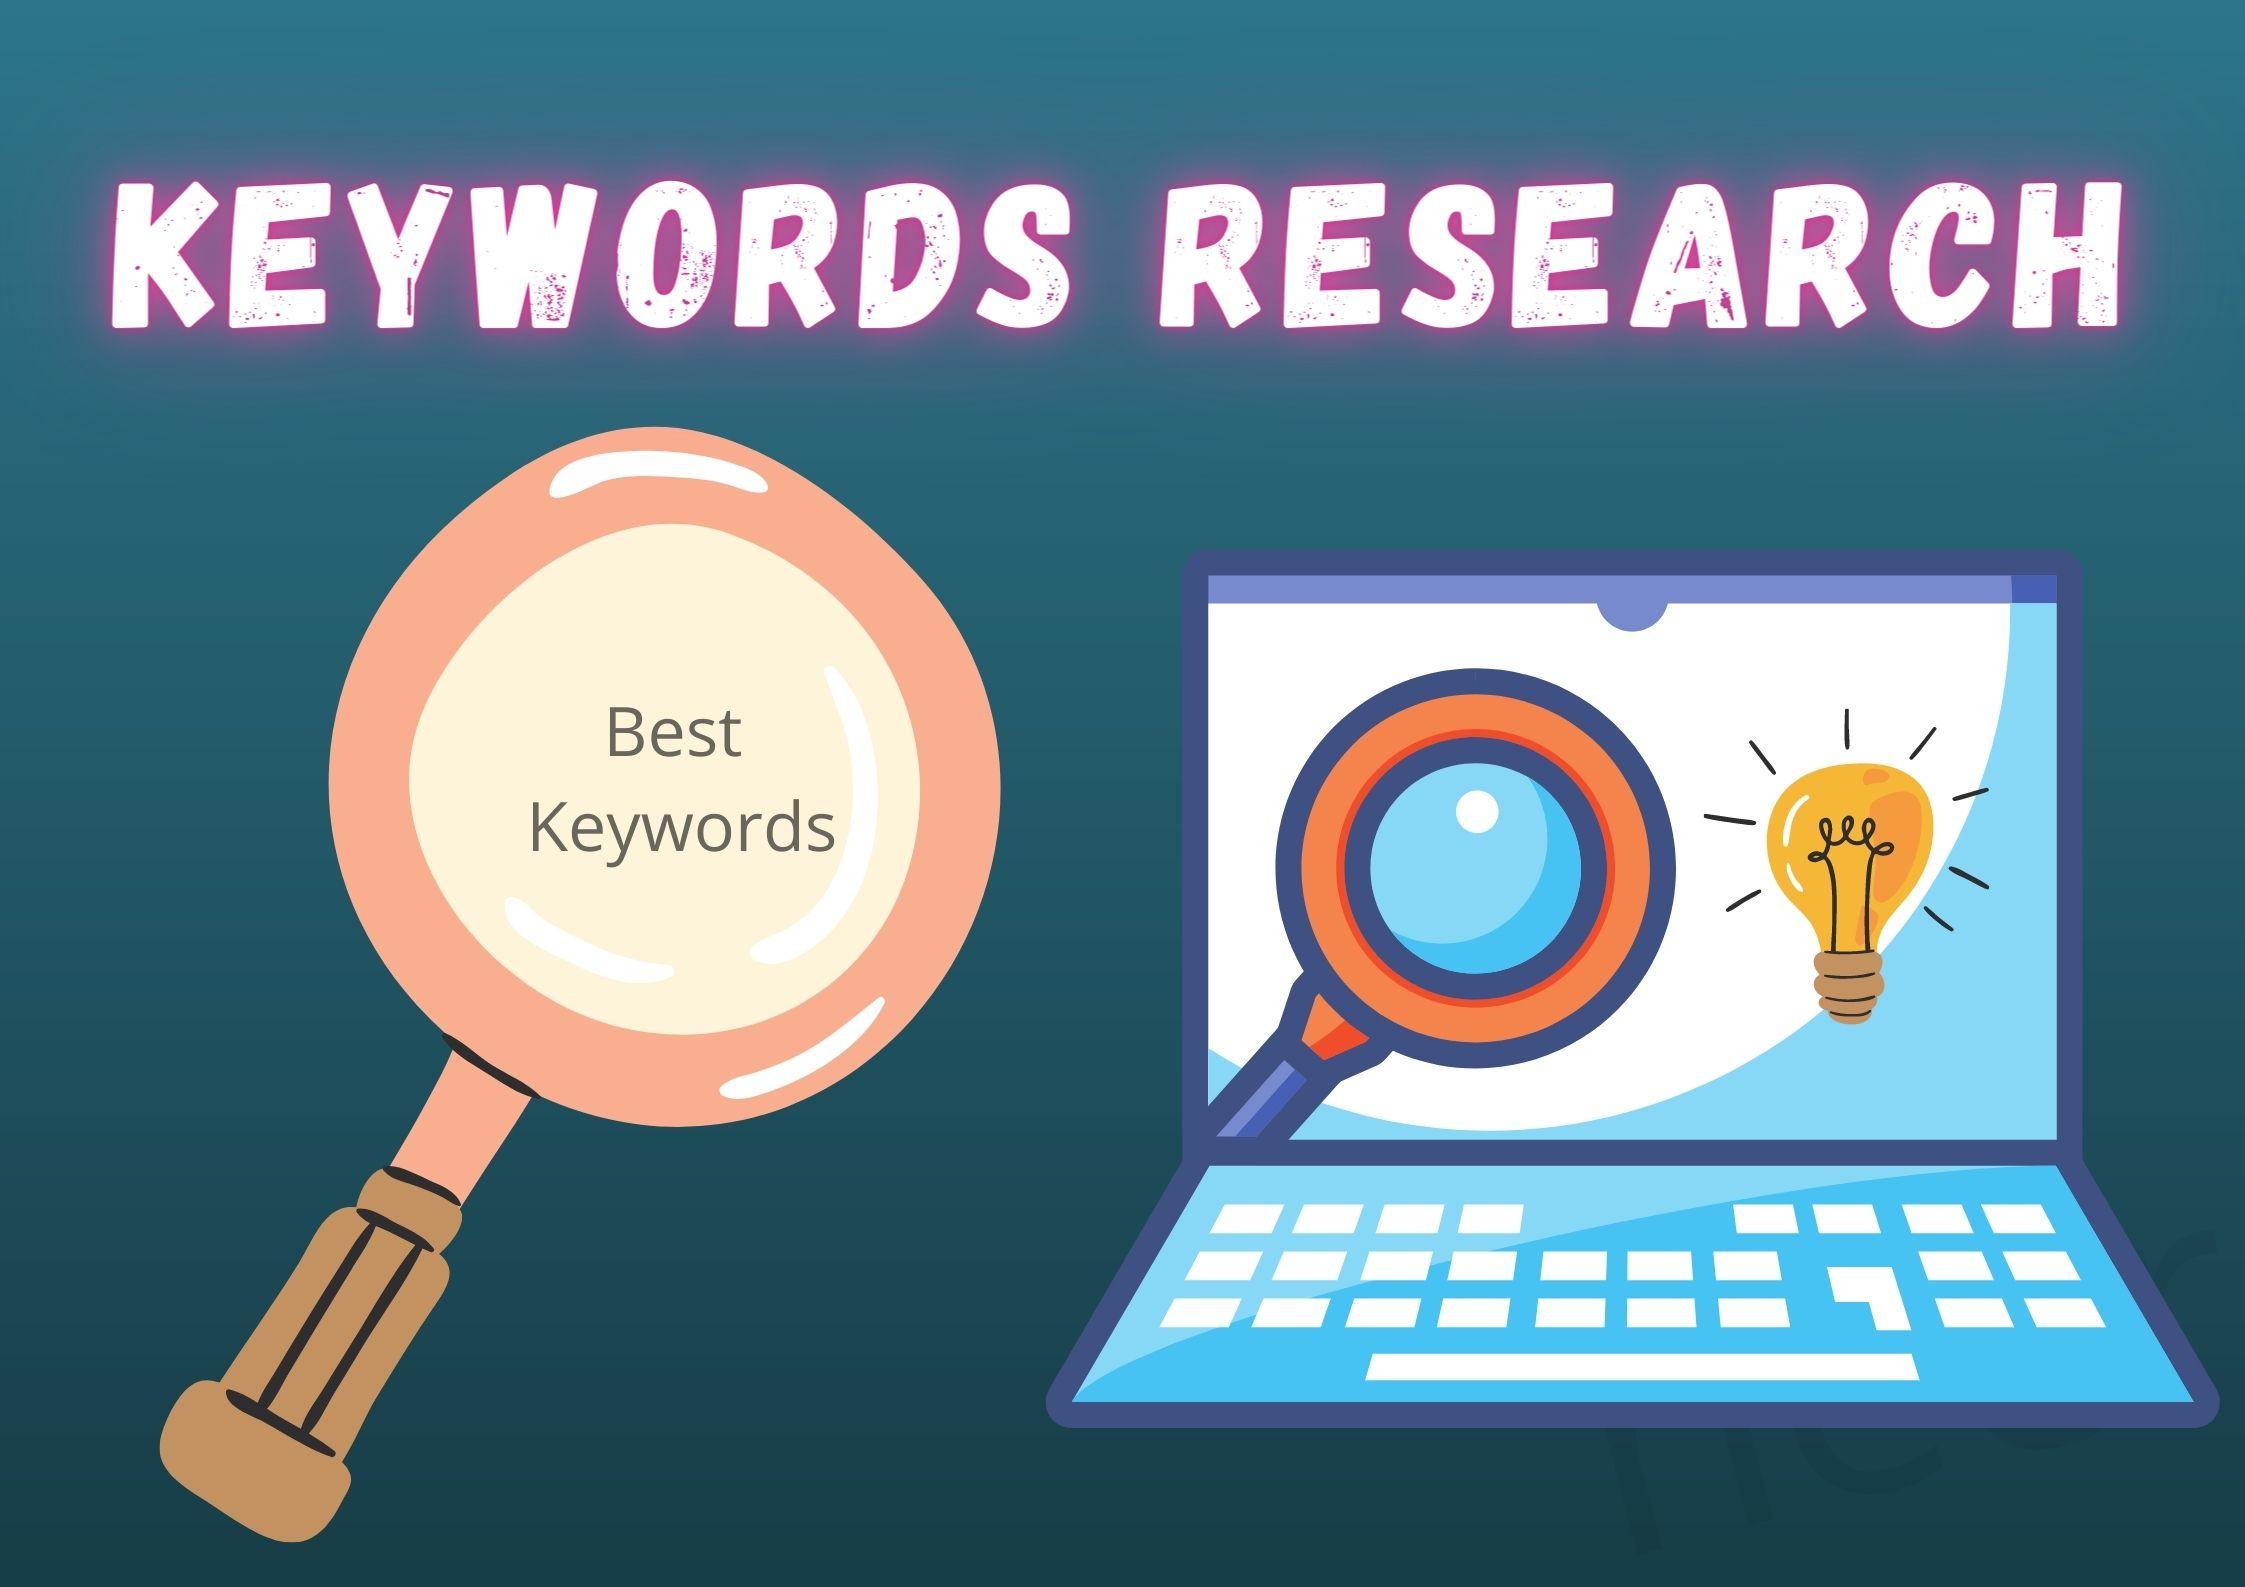 I will find best keywords for your website